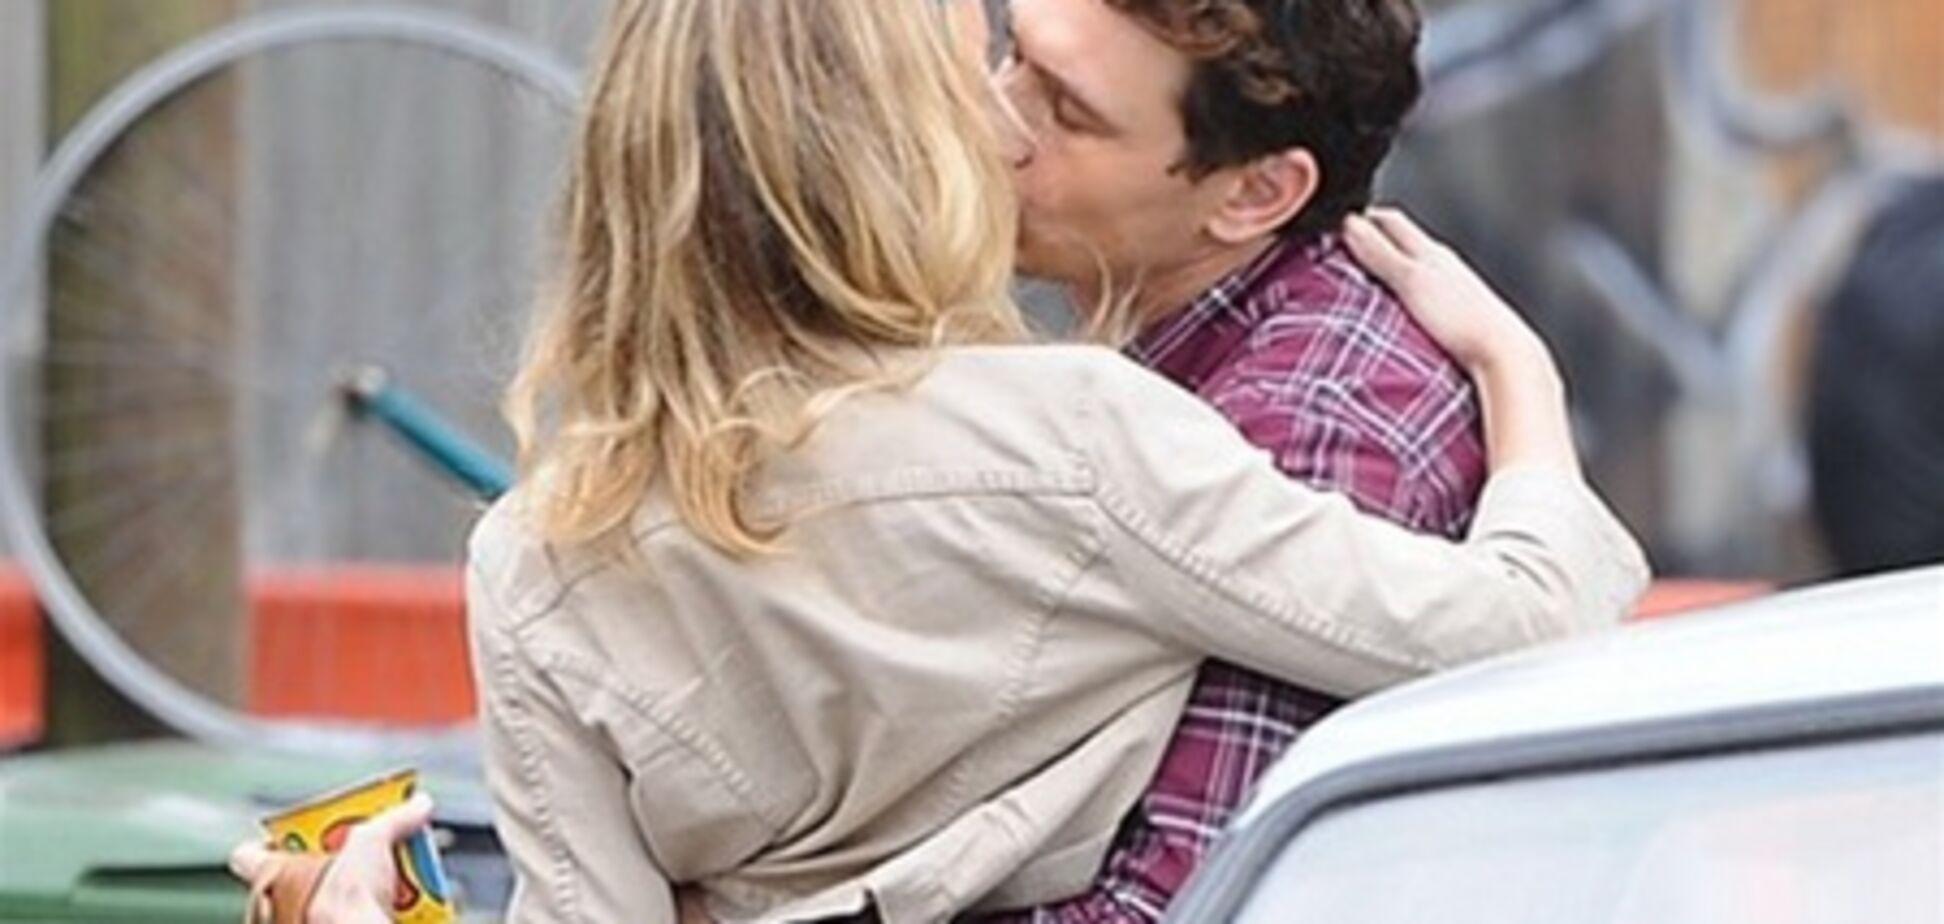 Кейт Хадсон застукали за поцелуями с Джеймсом Франко